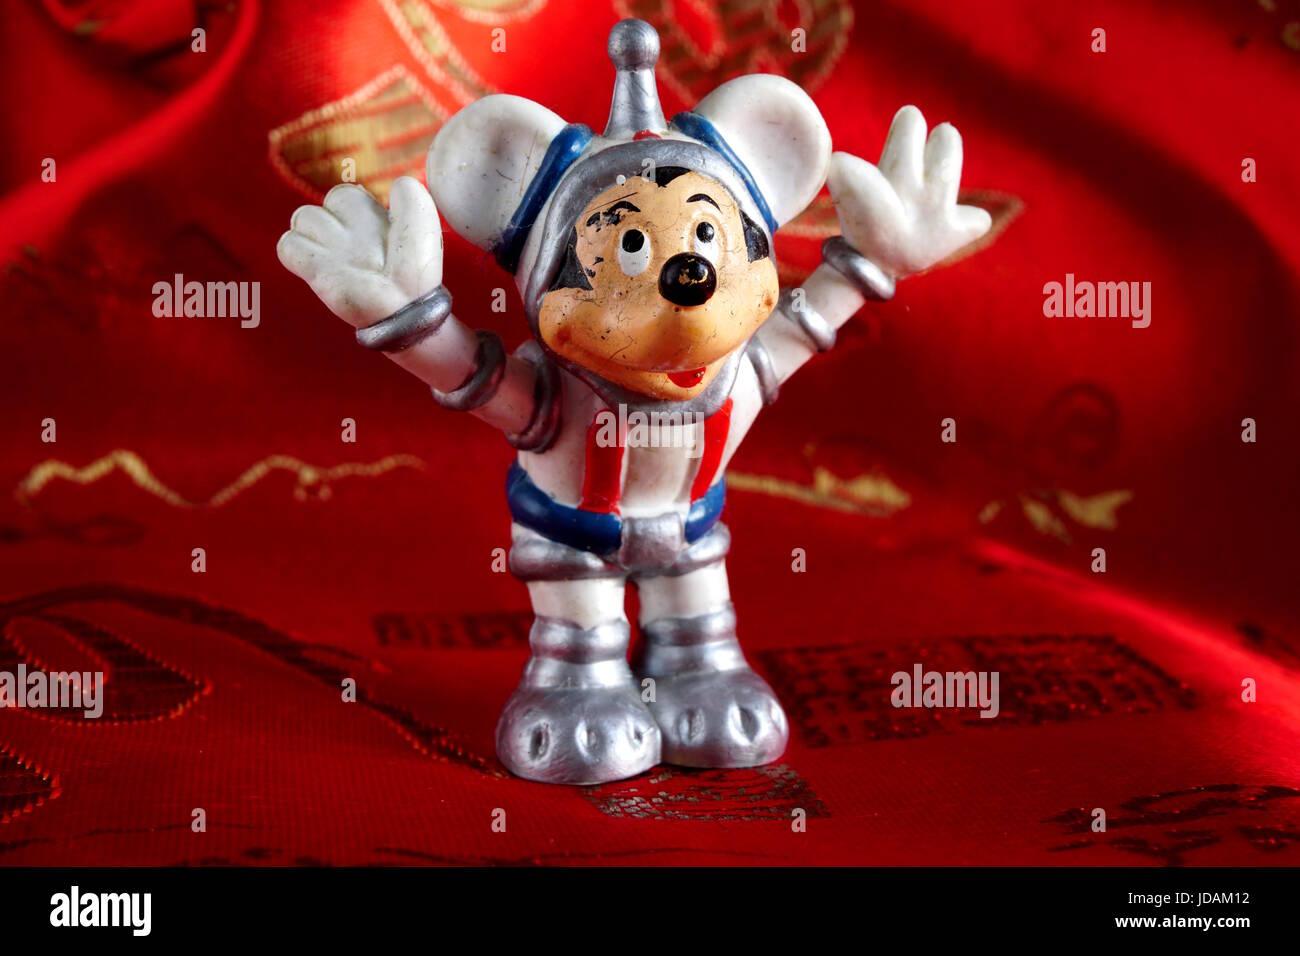 Spaceman Mickey-Mouse-Spielzeug Stockbild